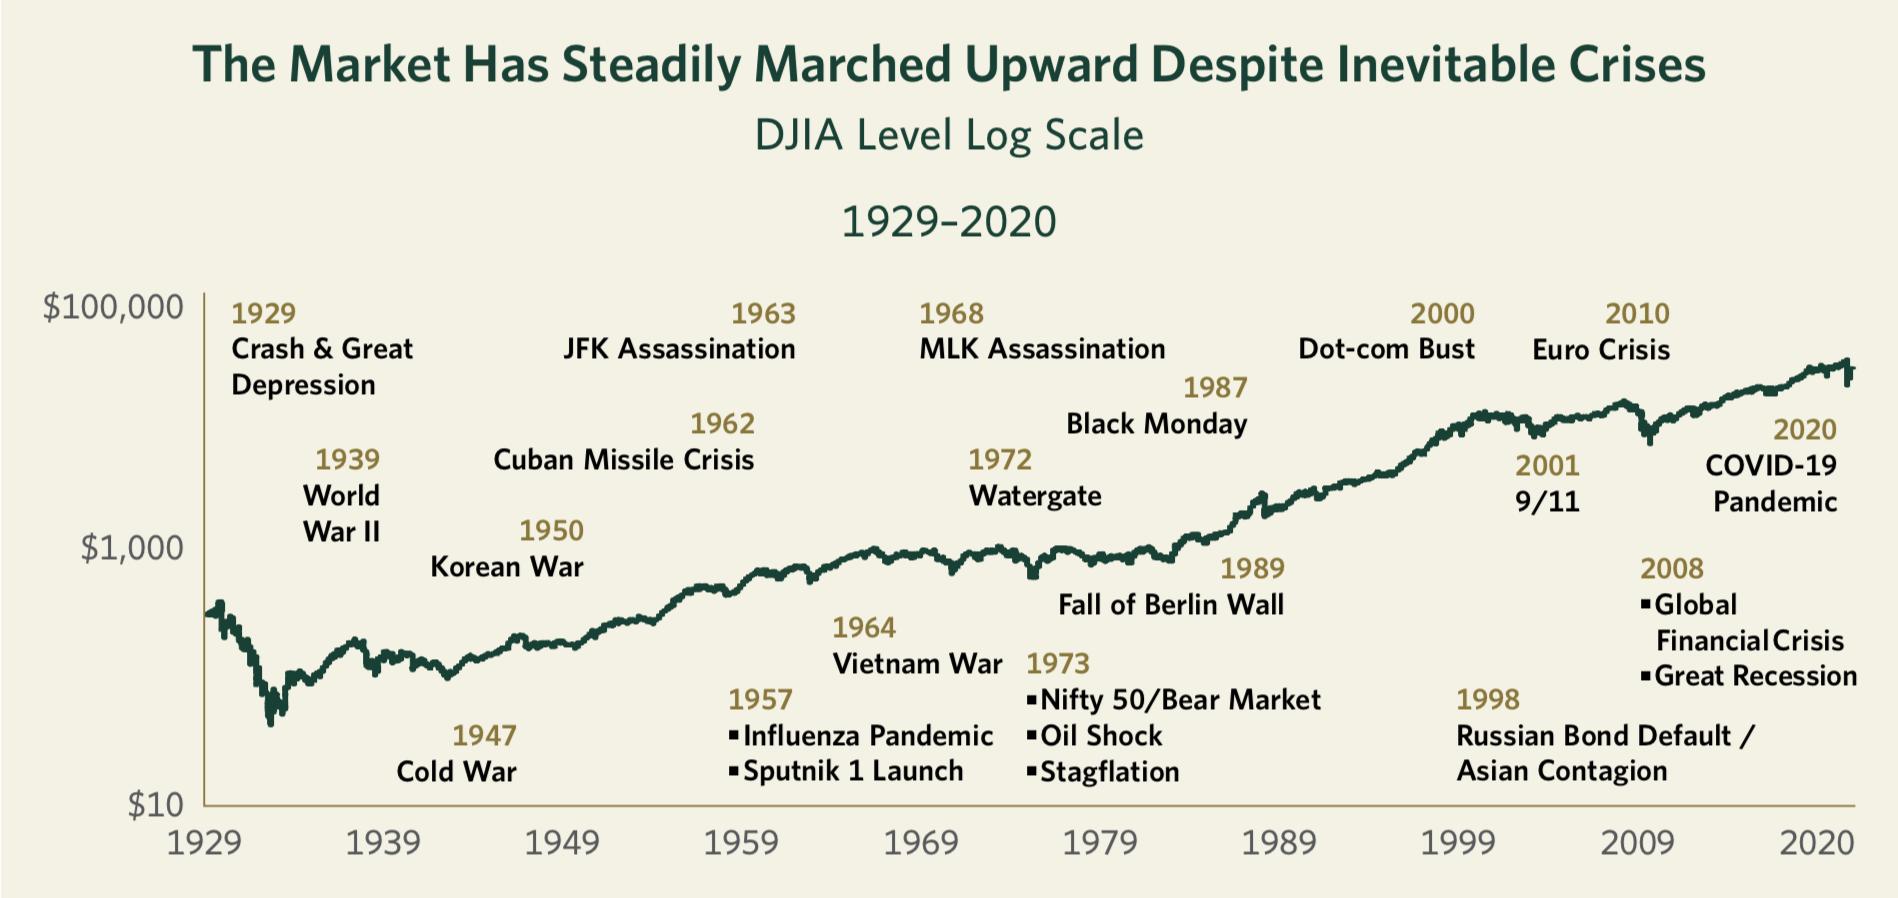 The Market Has Steadily Marched Upward Despite Inevitable Crises